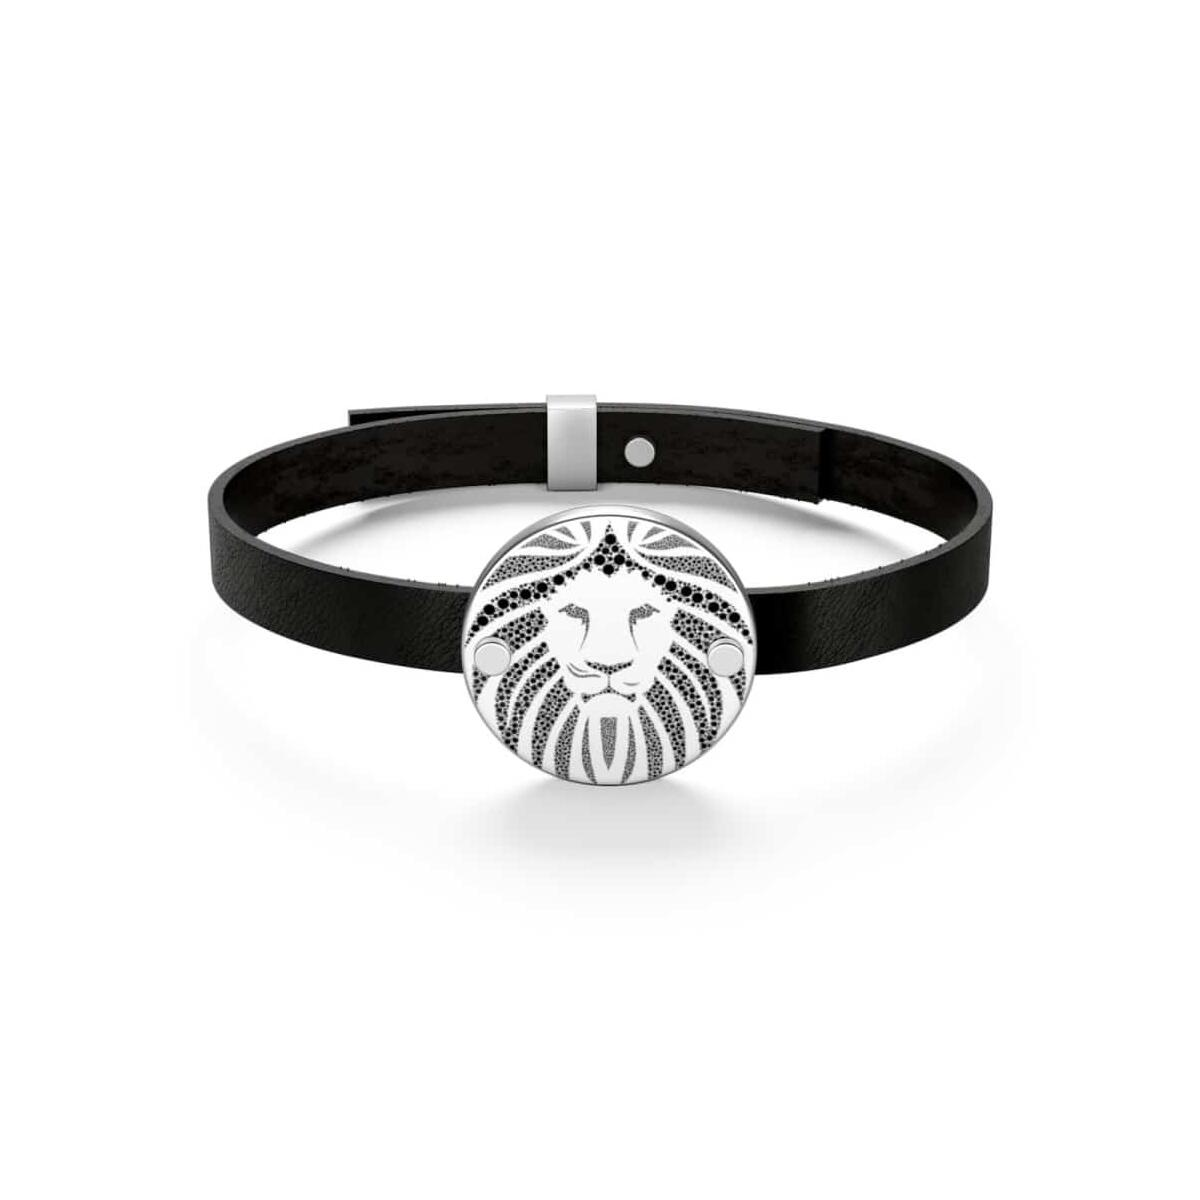 African Leather Bracelet, bainescoin / Silver